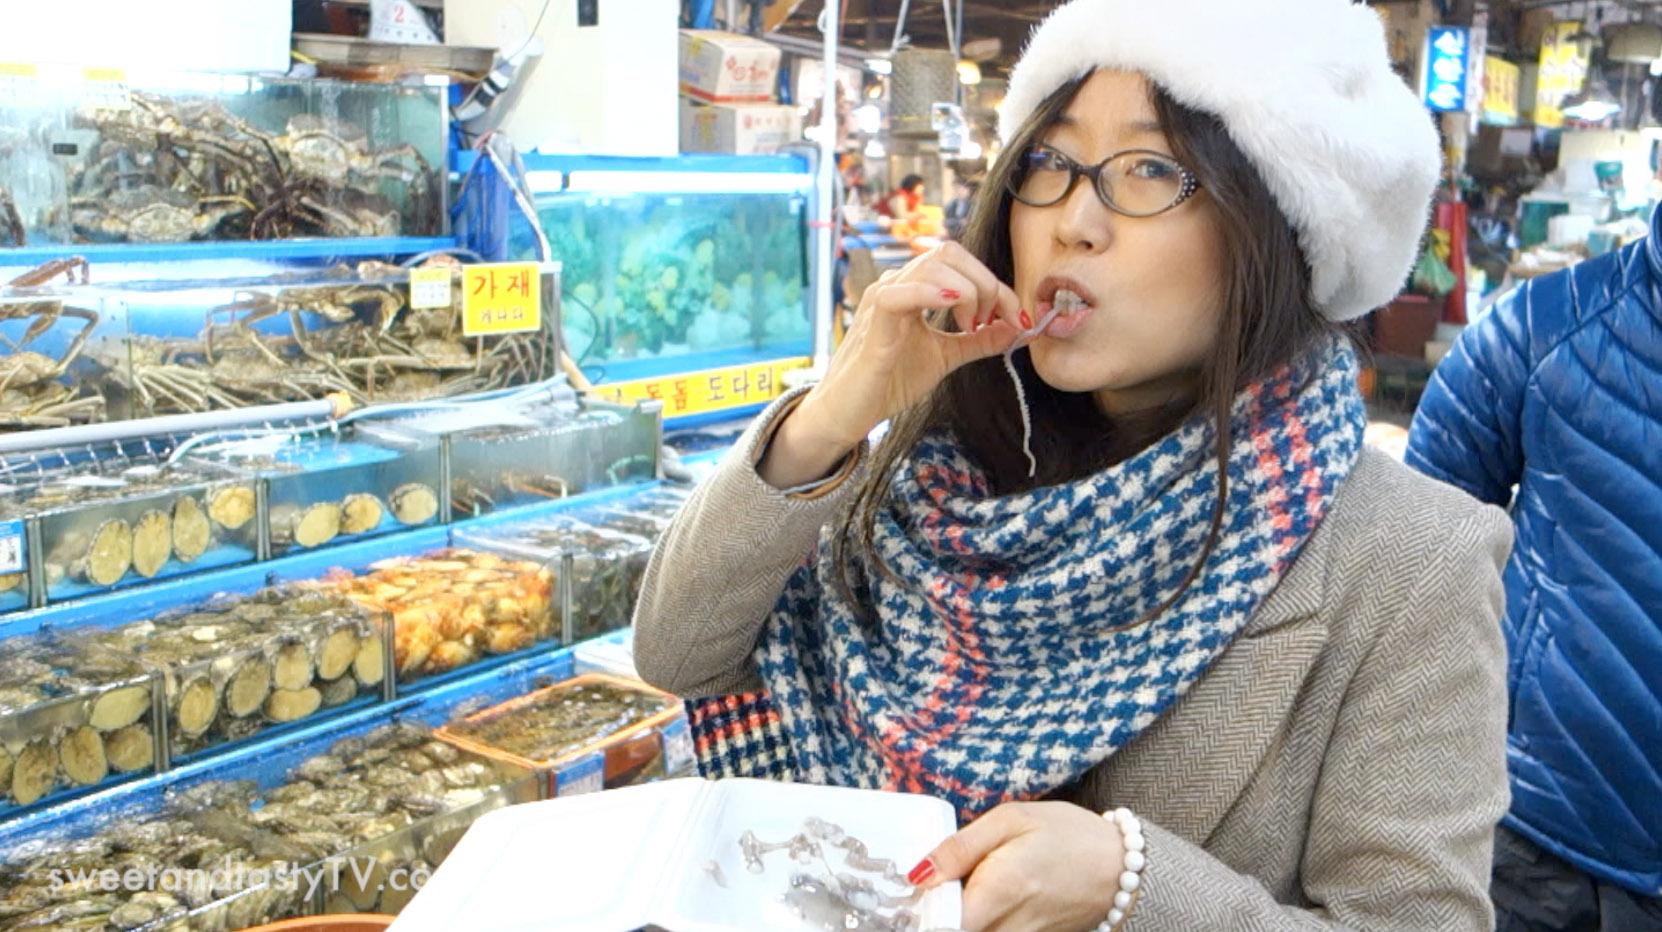 Eating Live Octopus At Noryangjin Market Sweetandtastytv